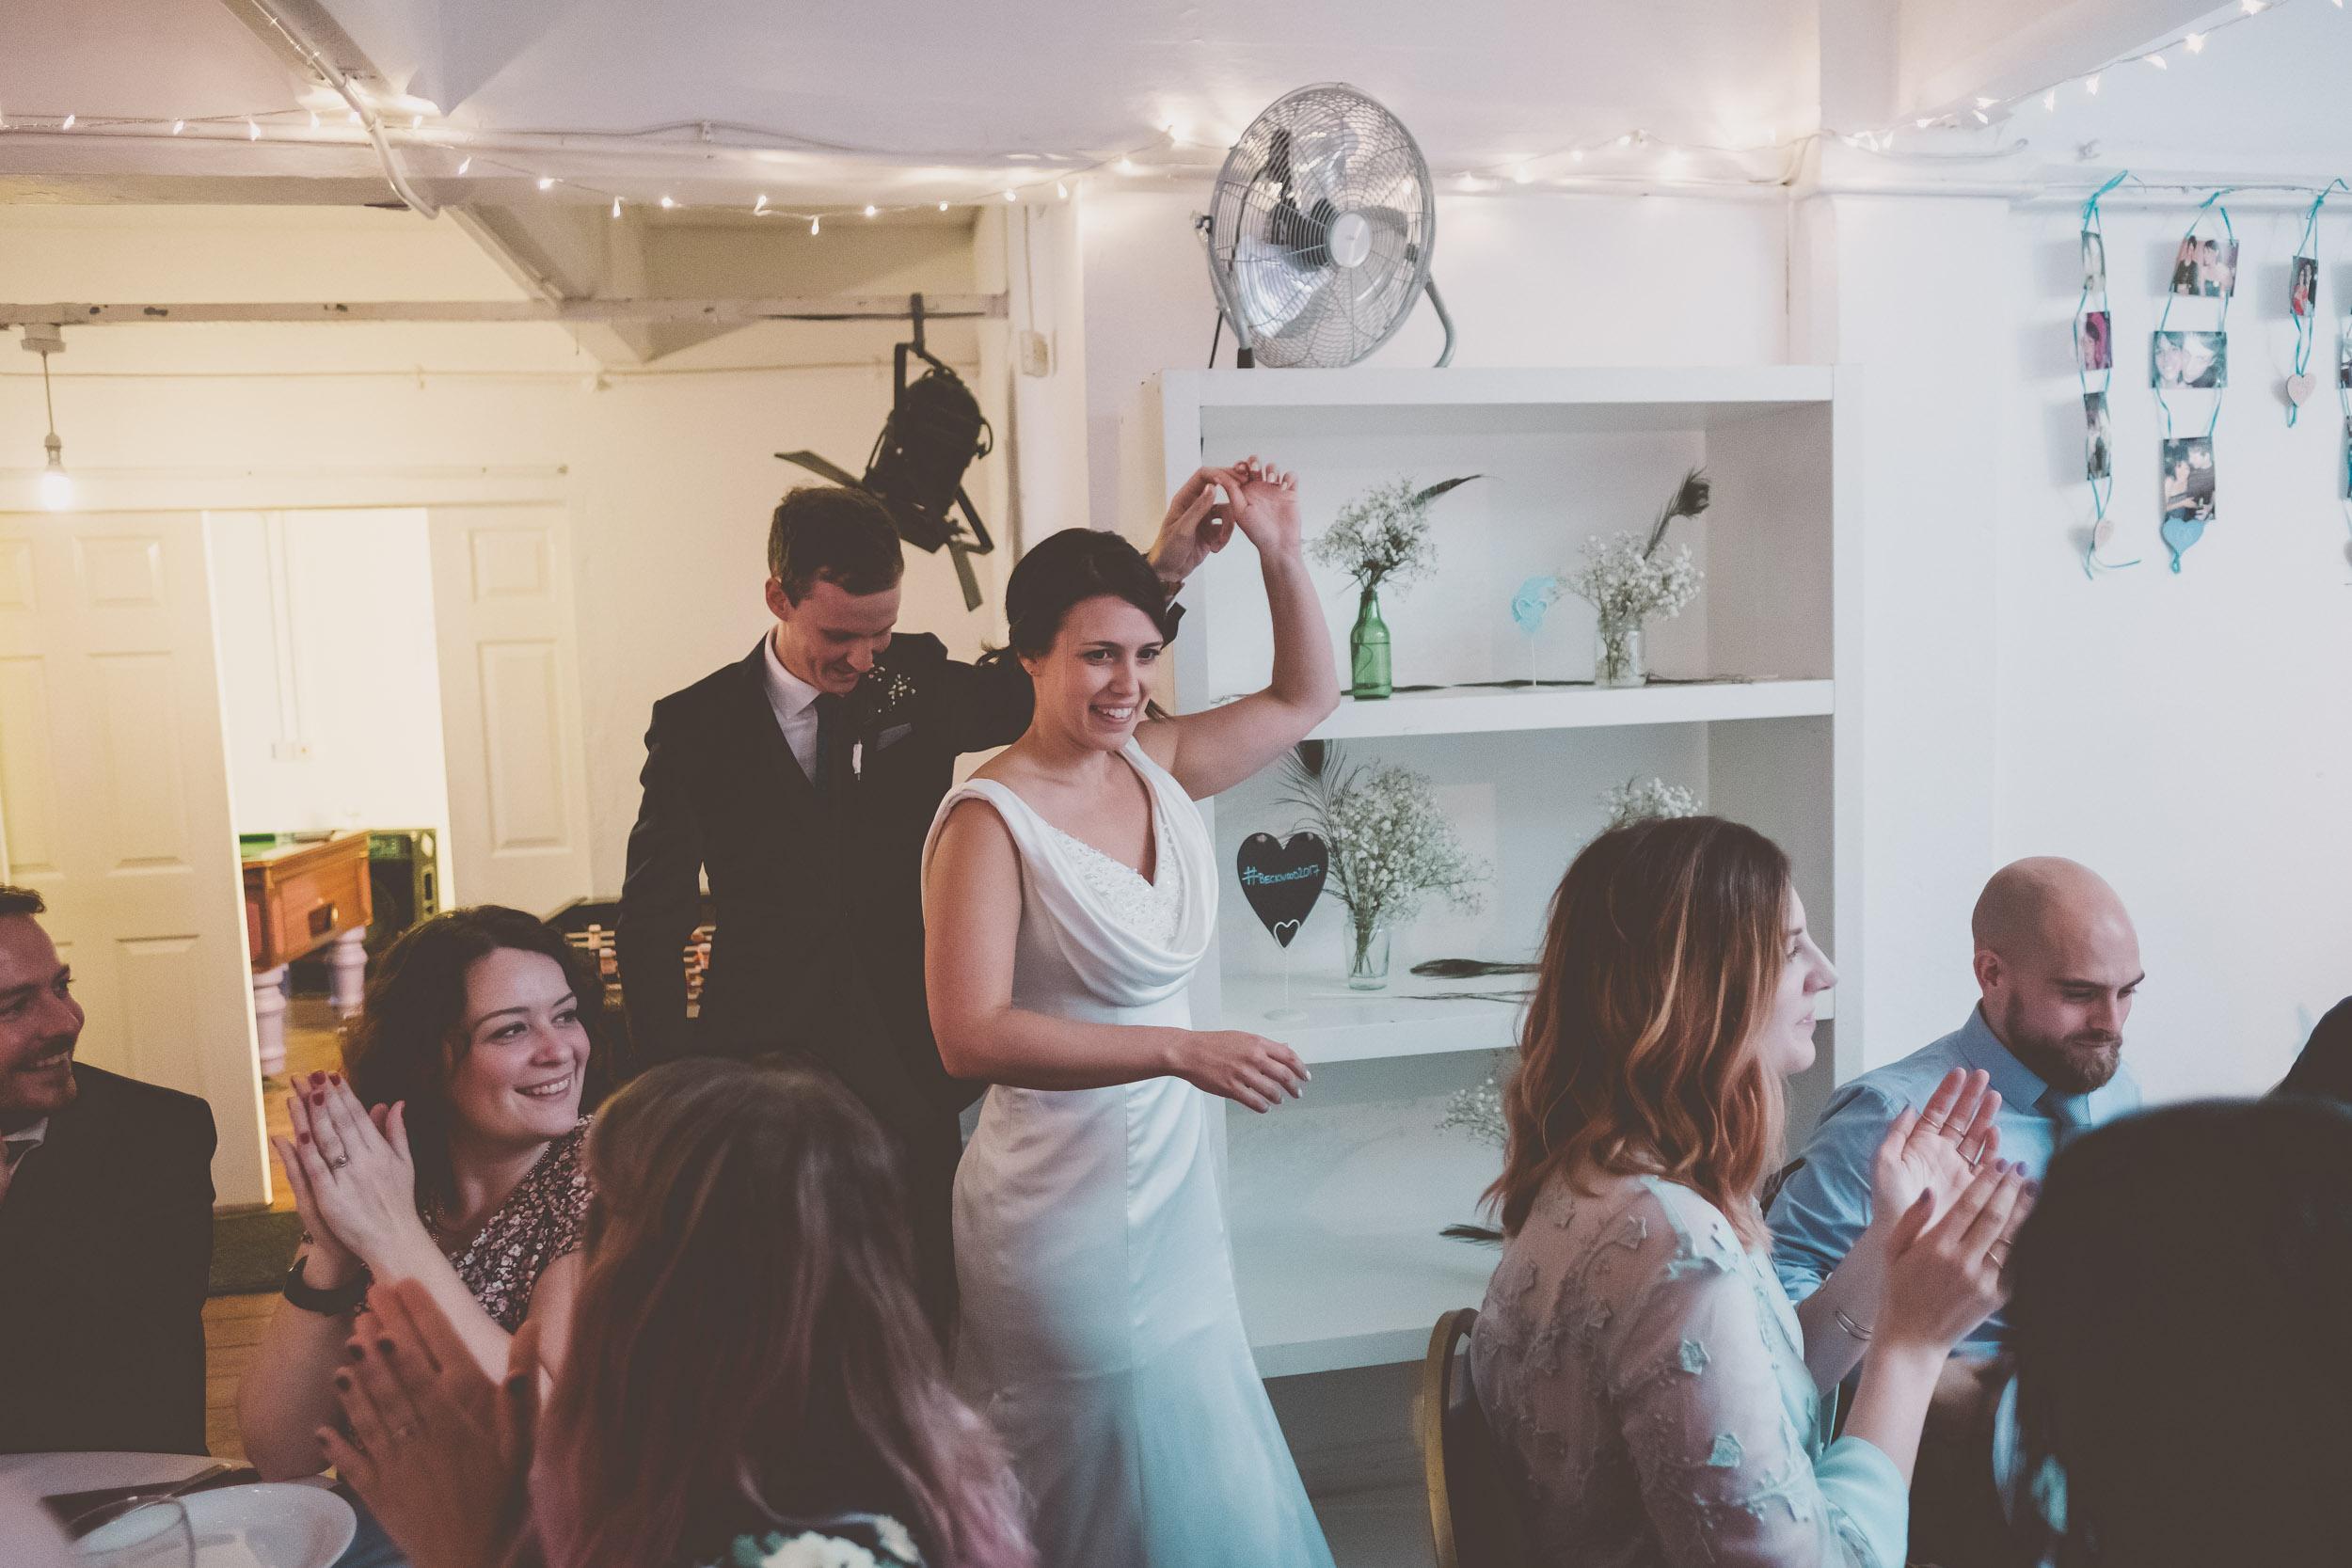 islington-town-hall-4th-floor-studios-wedding344.jpg